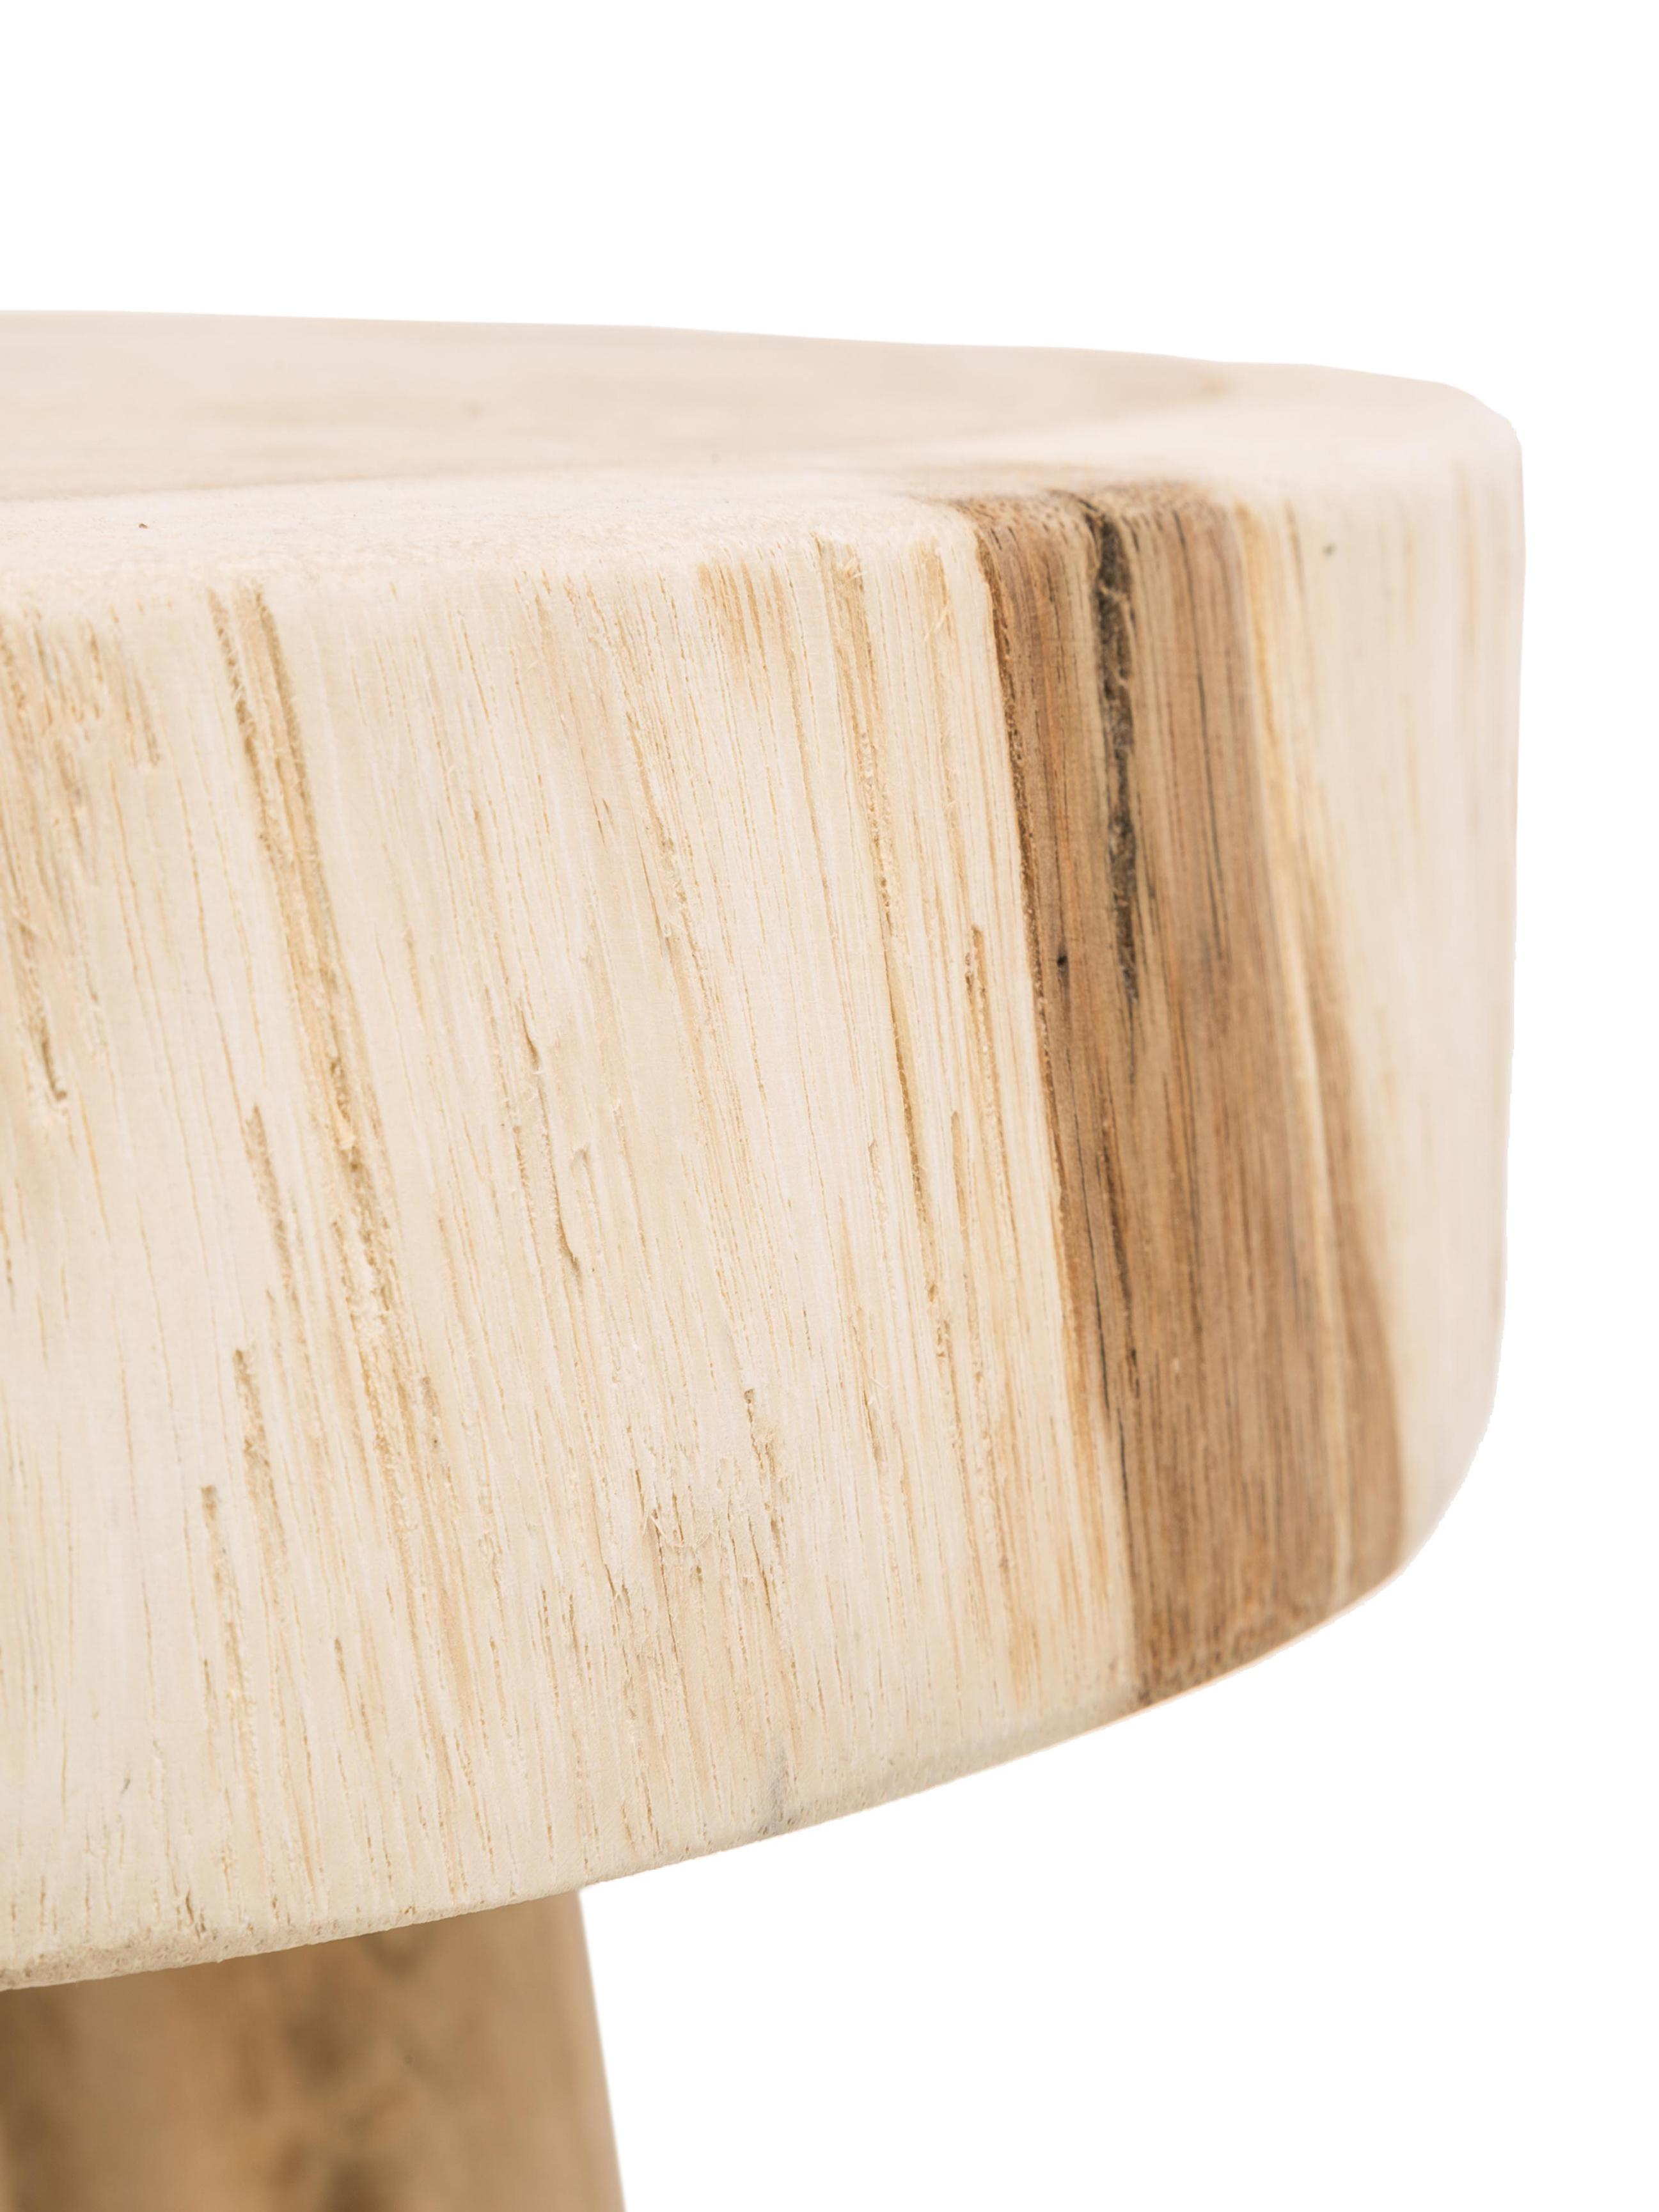 Taburete redondo de madera Beachside, Madera de mungur natural, Bayo, Ø 40 x Al 50 cm